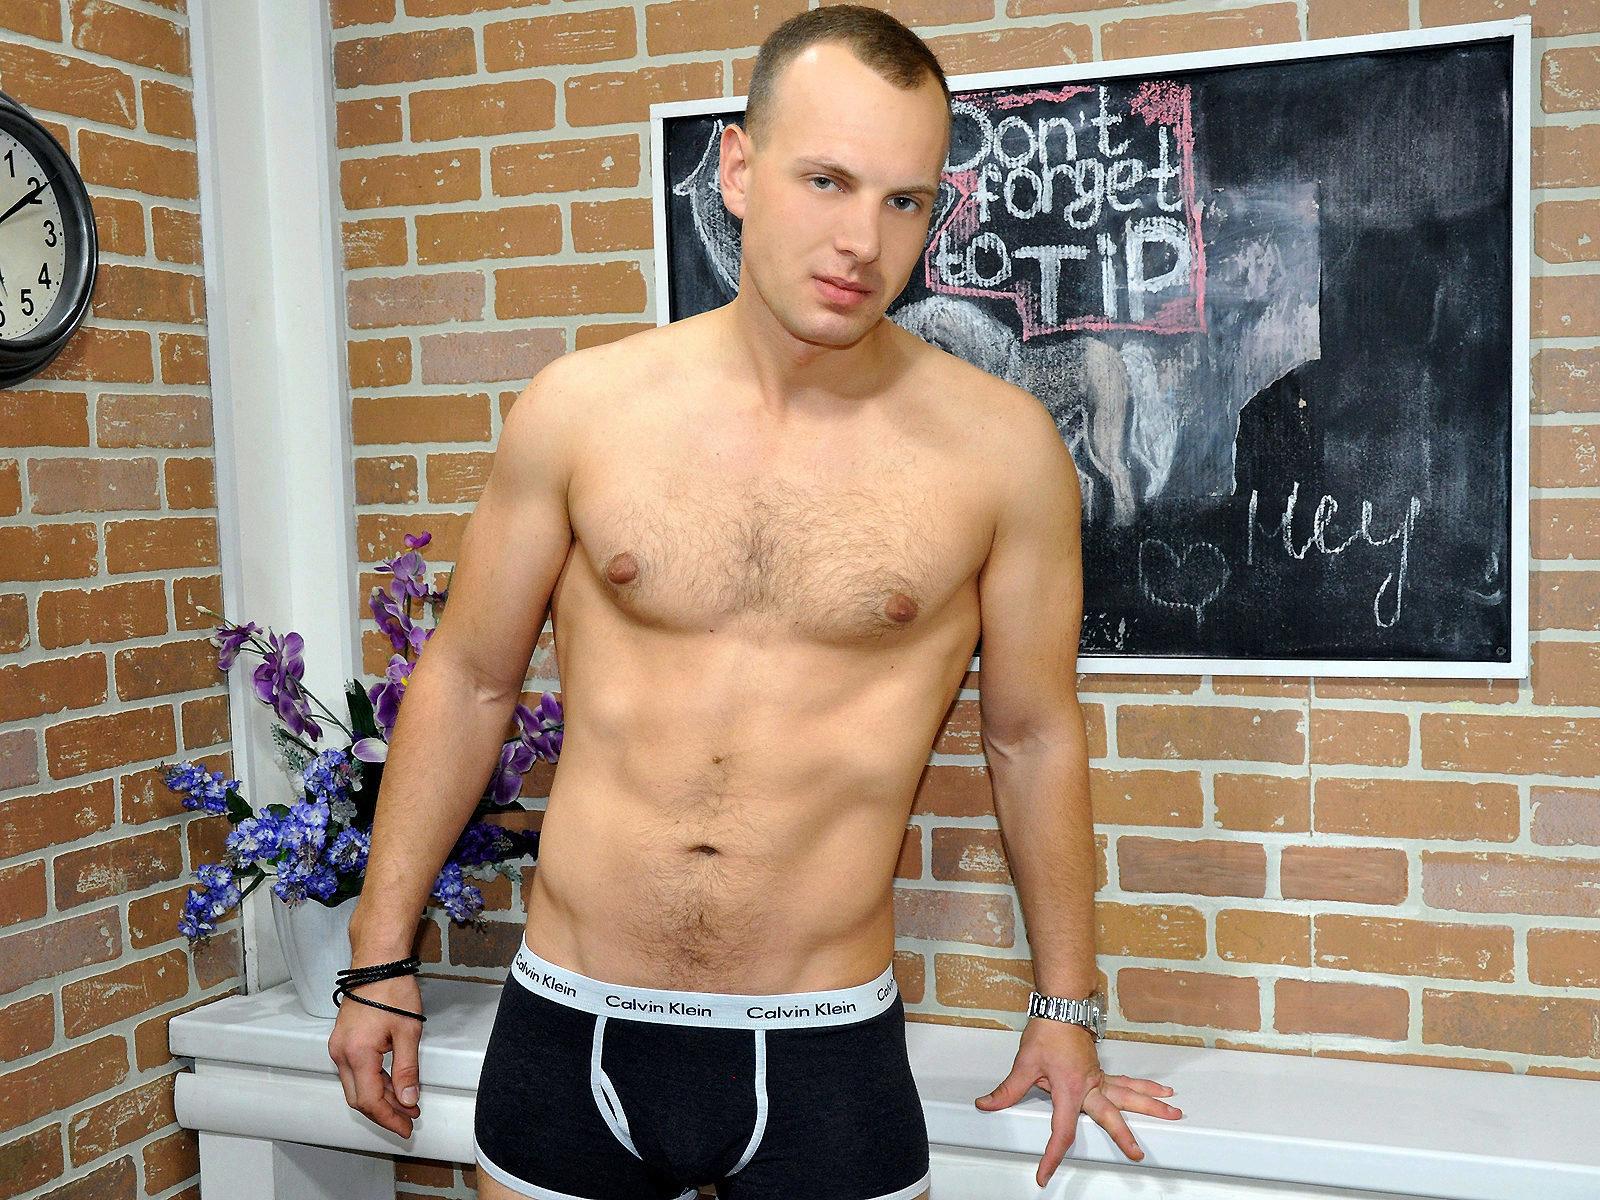 Nude free gay porn lusty puppy sex